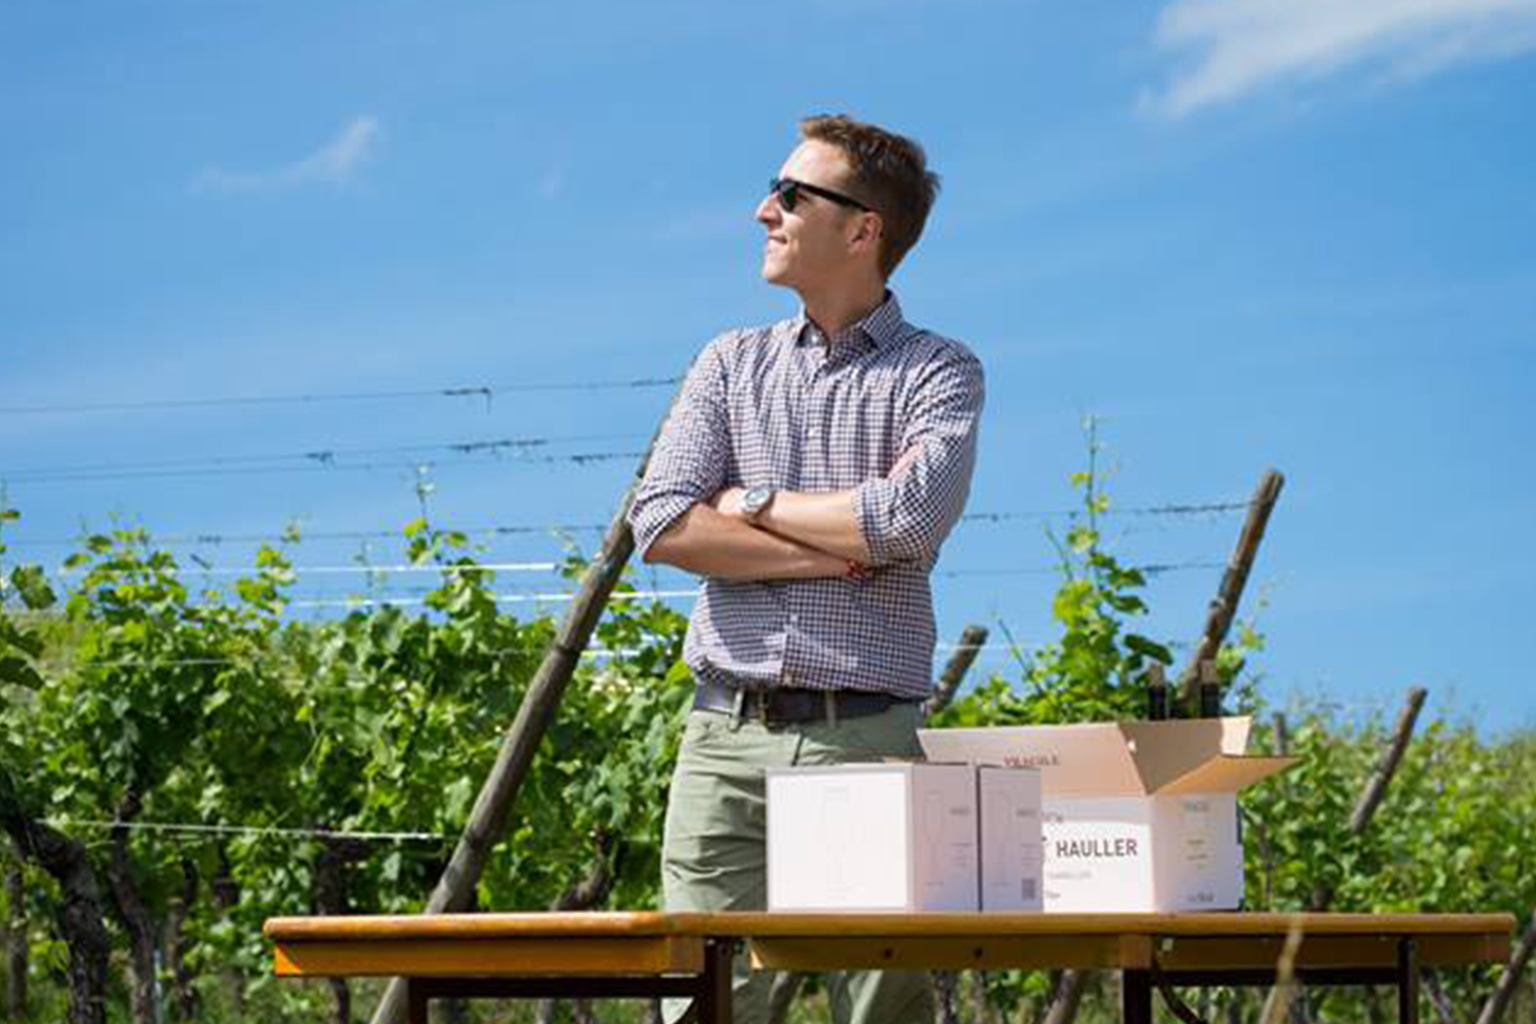 Domaine Louis Hauller - アペロ ワインバー オーガニックワインxフランス家庭料理 - 東京都港区南青山3-4-6 / apéro WINEBAR - vins et petits plats français